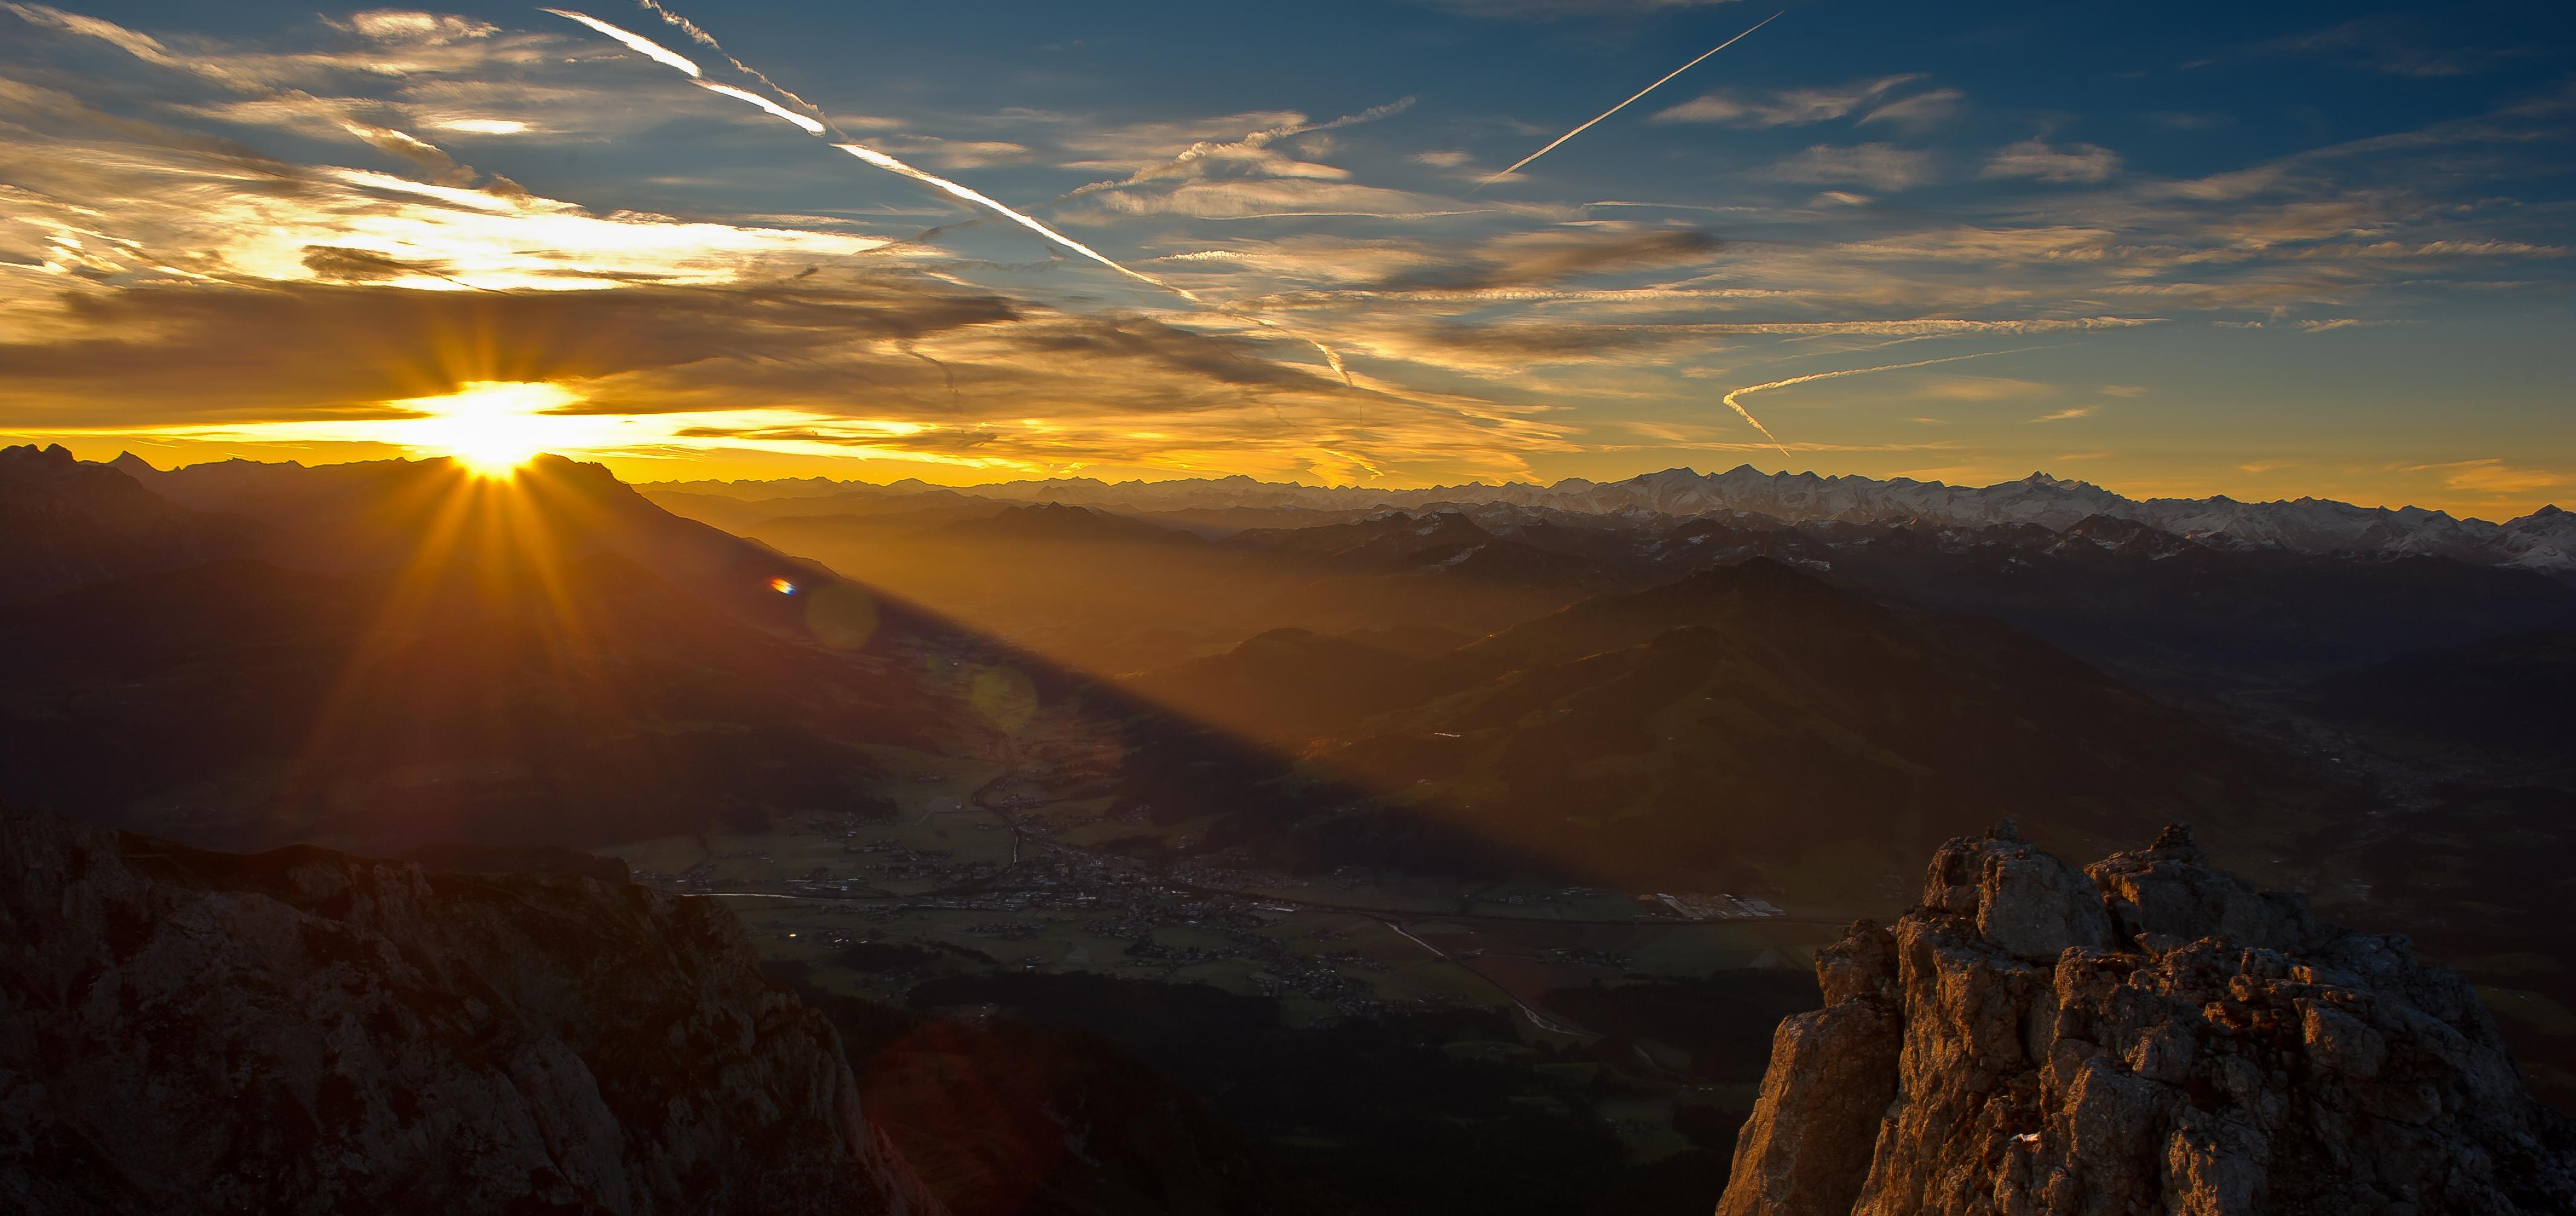 Sonnenaufgang-Landschaft_Wilder-Kaiser_Foto-Roland-Schonner-(2)©tvbwilderkaiser